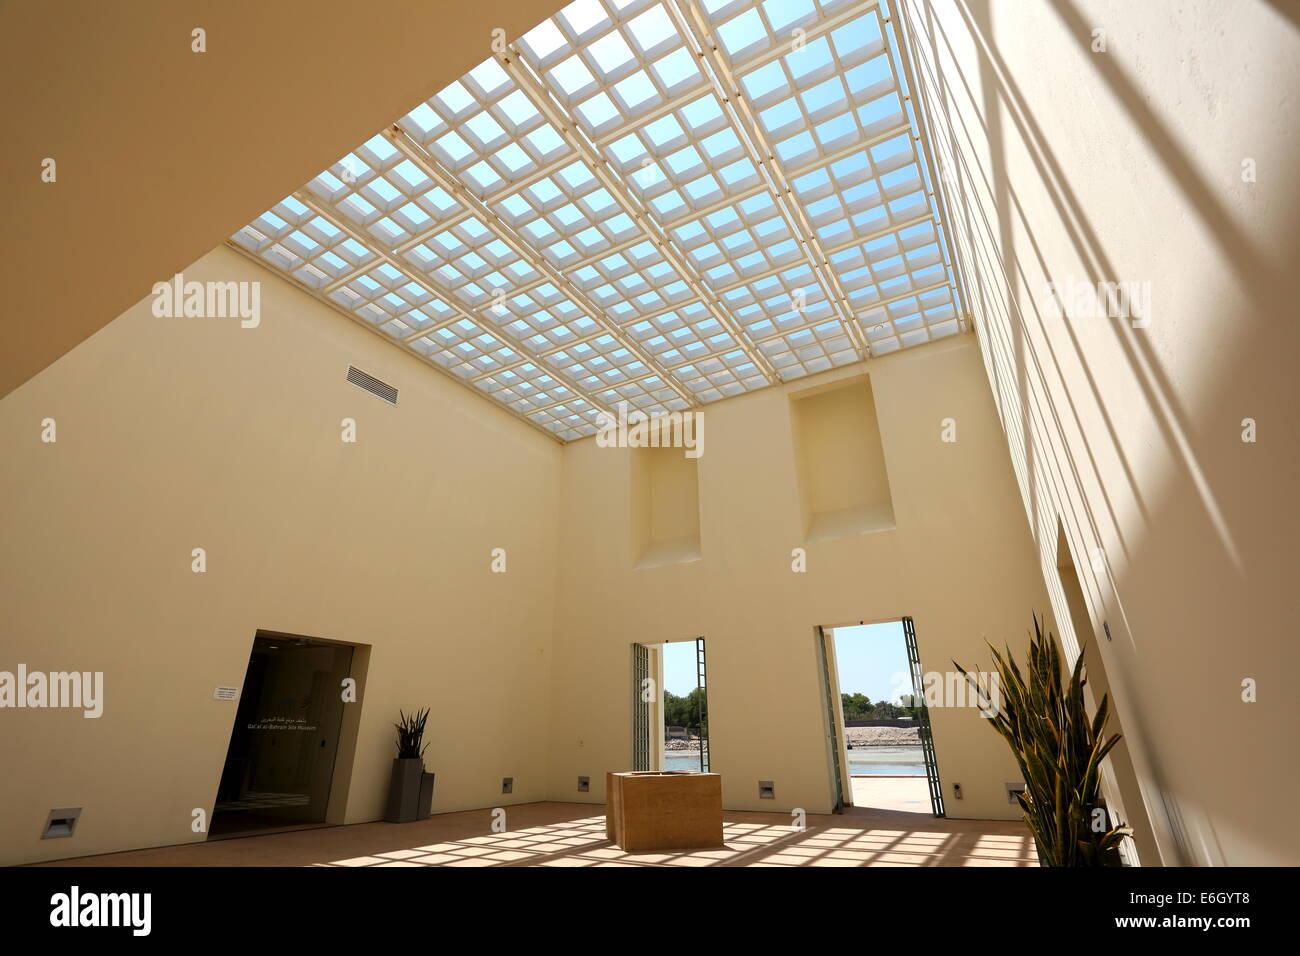 Entrance to the Bahrain Fort Museum, Al Qalah, Kingdom of Bahrain Stock Photo